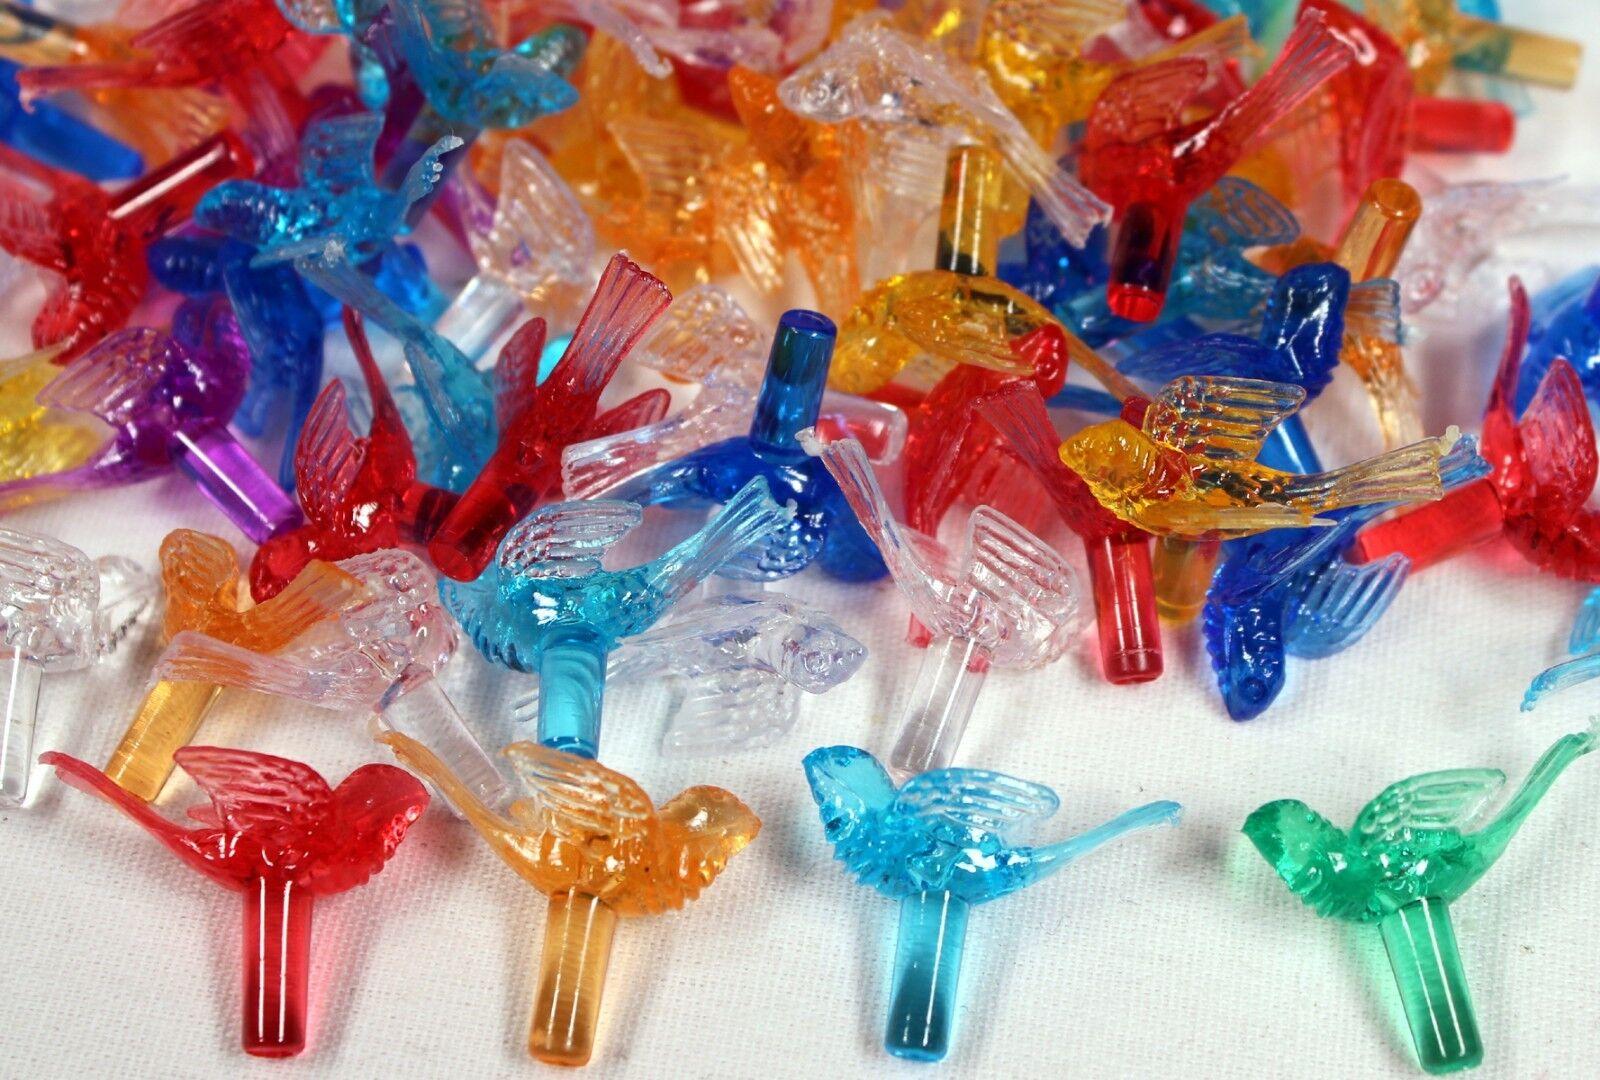 Plastic Bird Lites for Ceramic Christmas Trees, Multi Color Ornaments 100 pcs Christmas Trees